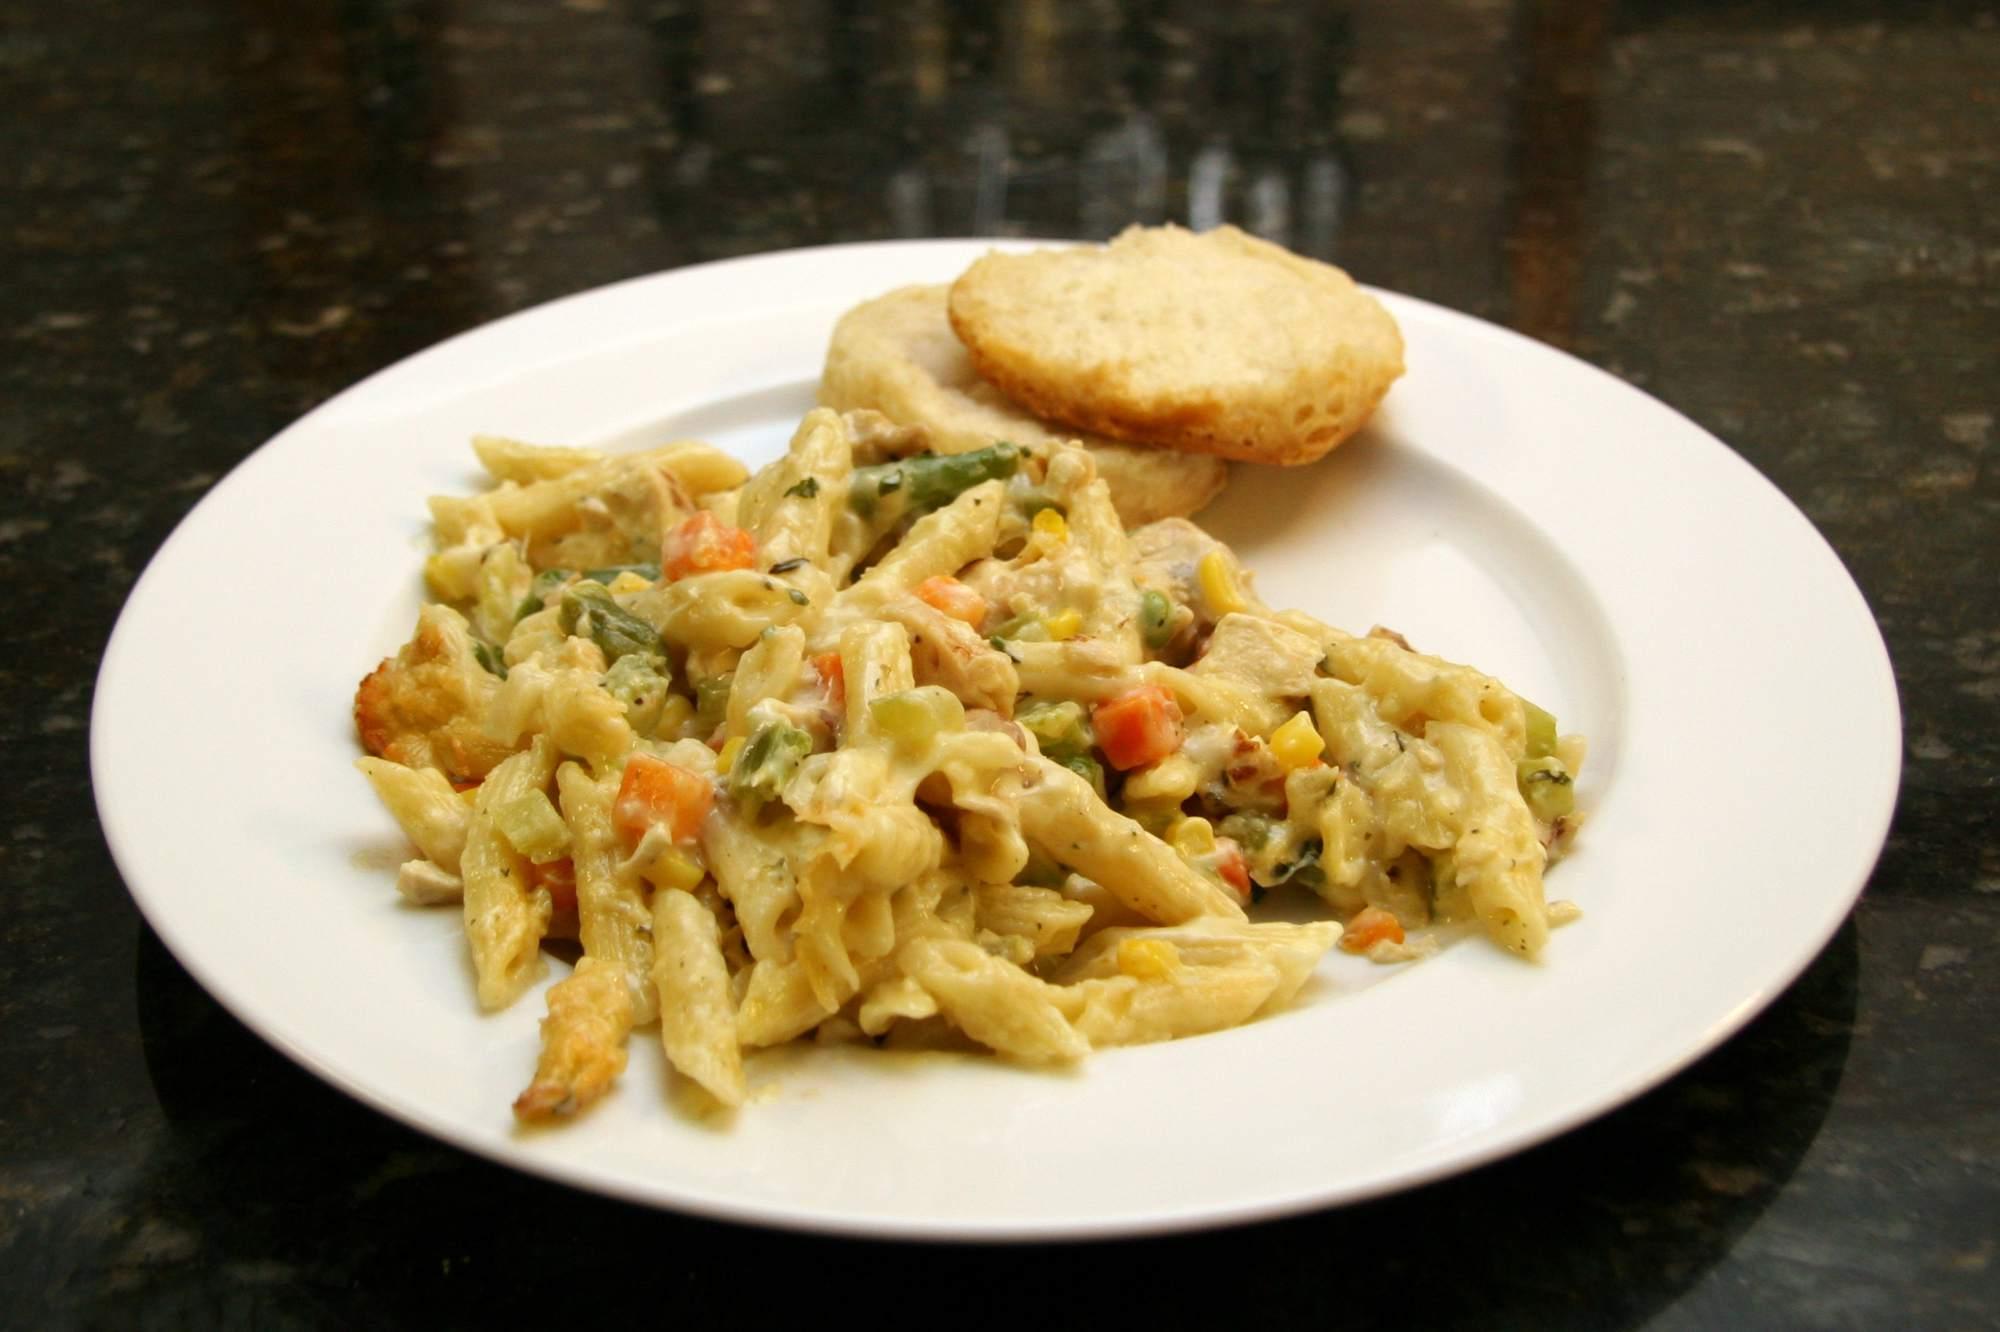 Chicken and Penne Casserole